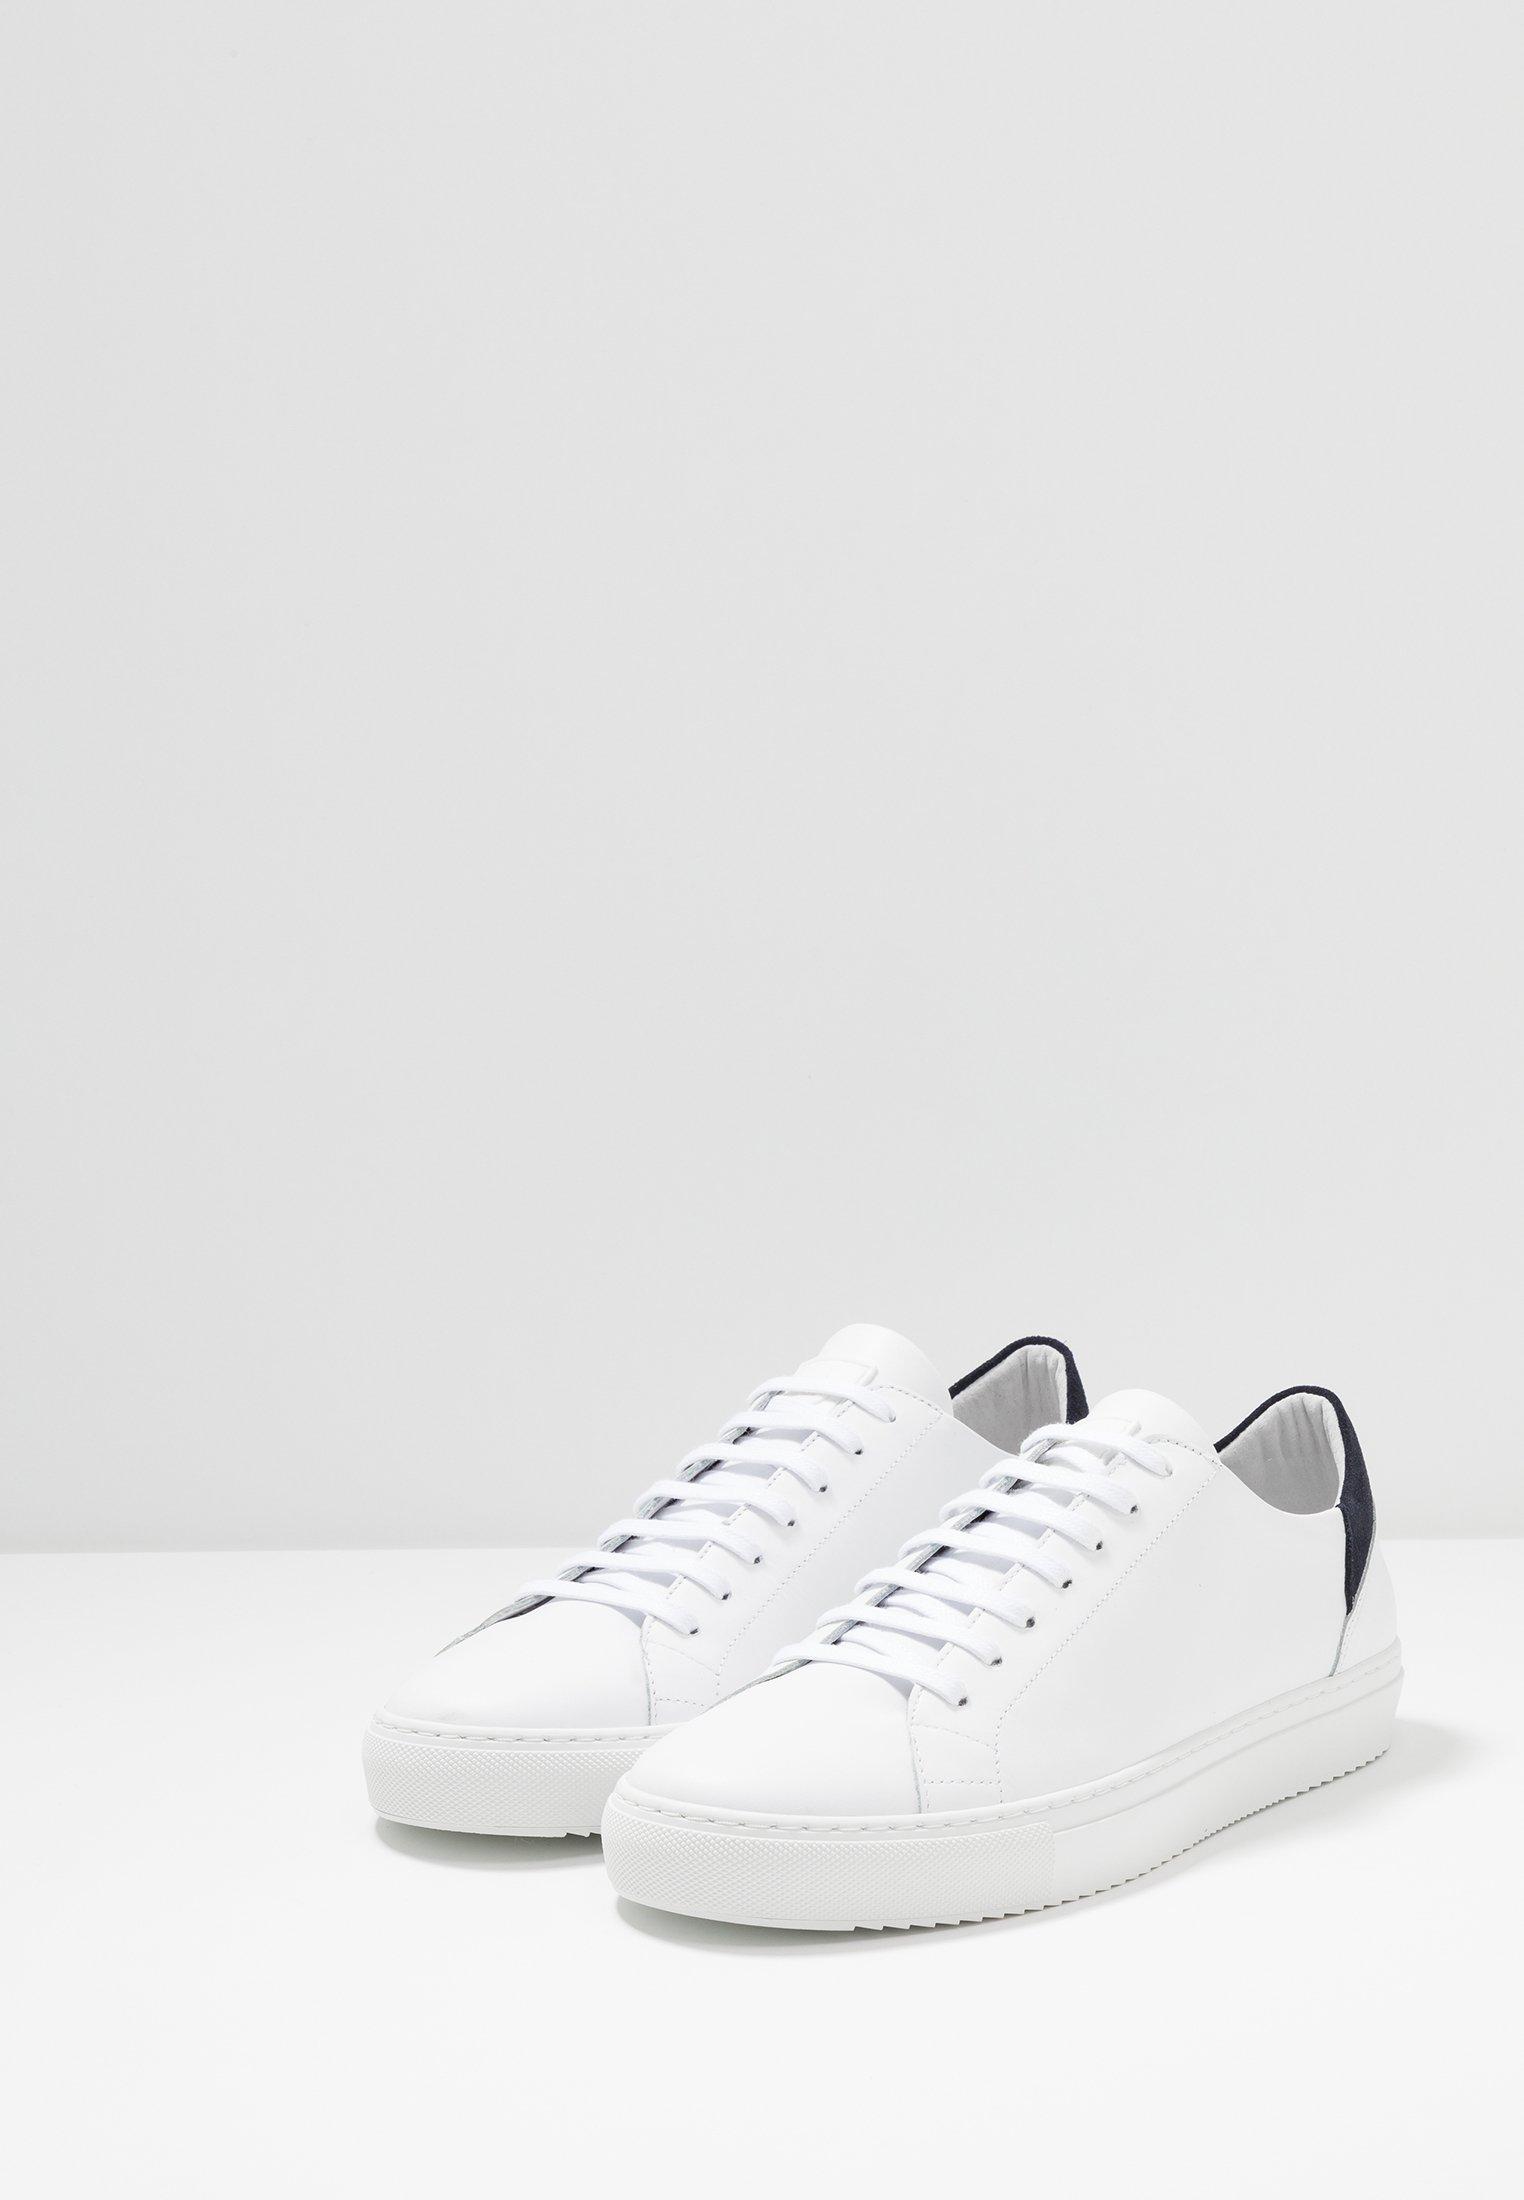 White Bullboxer RalphSneakers Basse Basse White Basse Bullboxer RalphSneakers RalphSneakers Bullboxer RalphSneakers Bullboxer White UqzSMVp